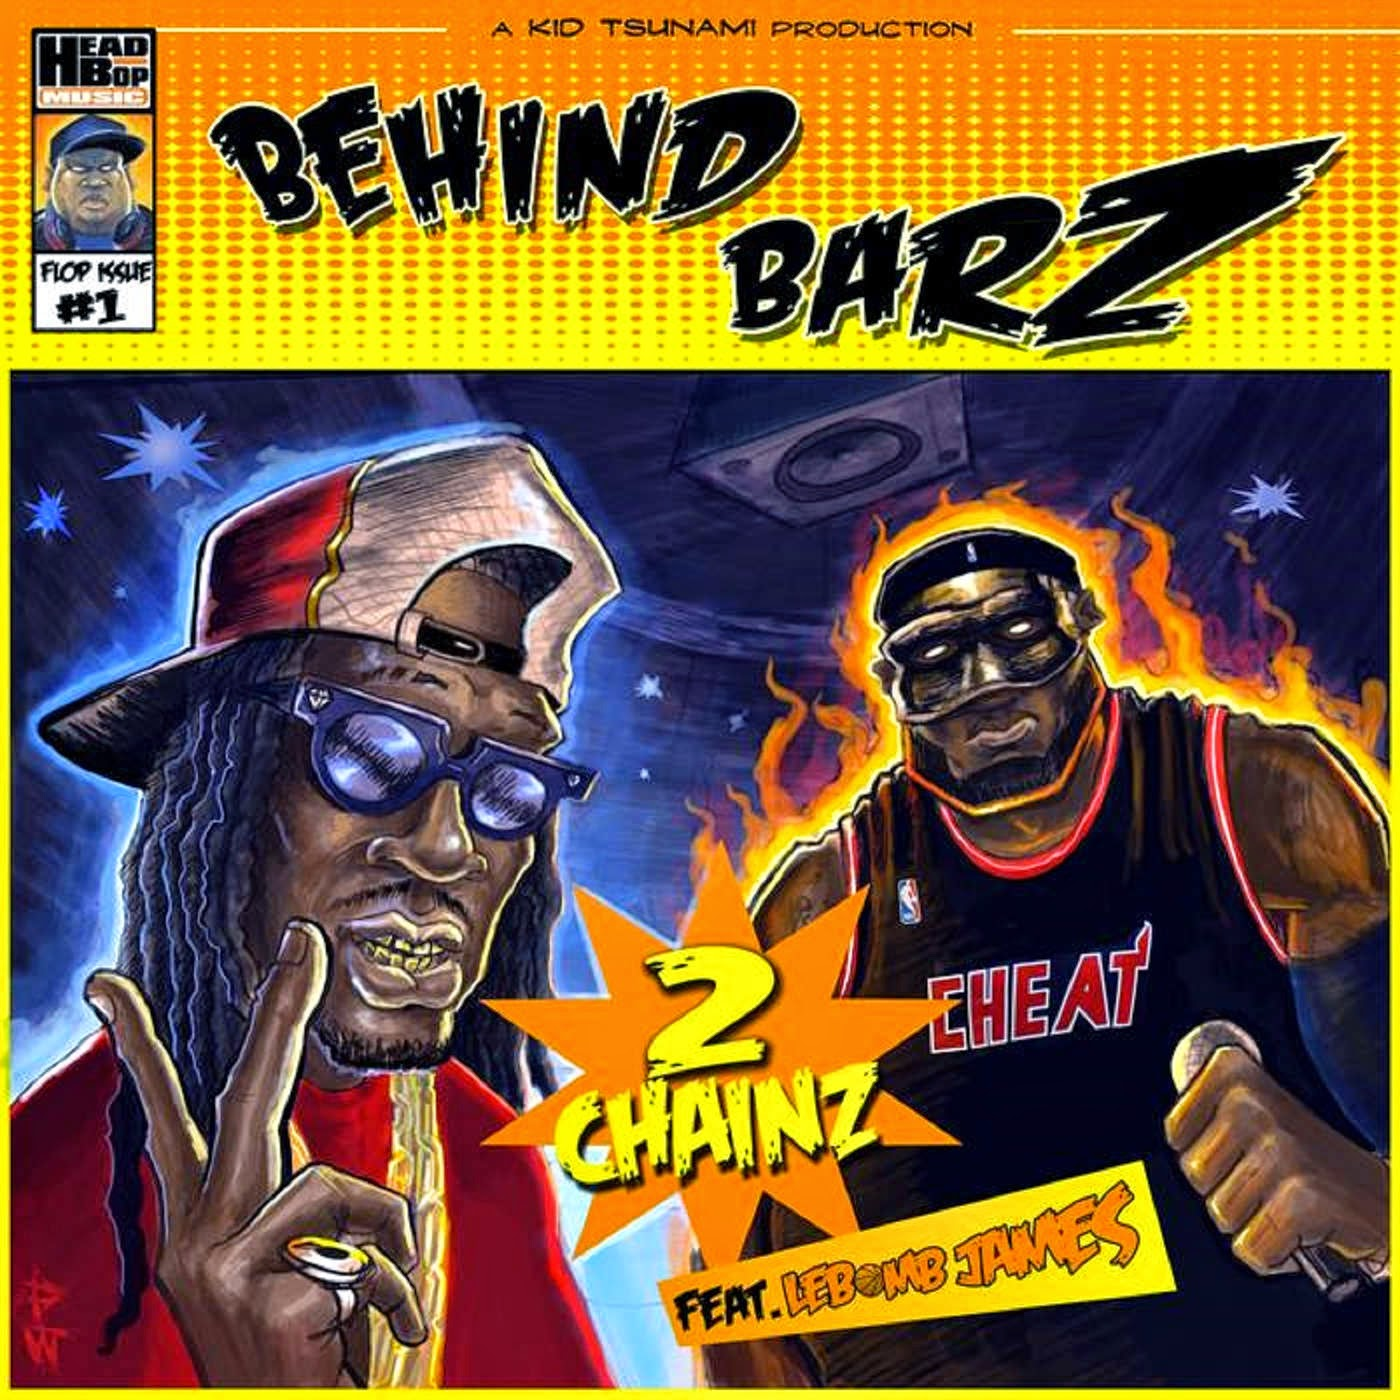 Kid Tsunami - Behind Barz (feat. 2 Chainz & Lebomb James) - EP Single Cover